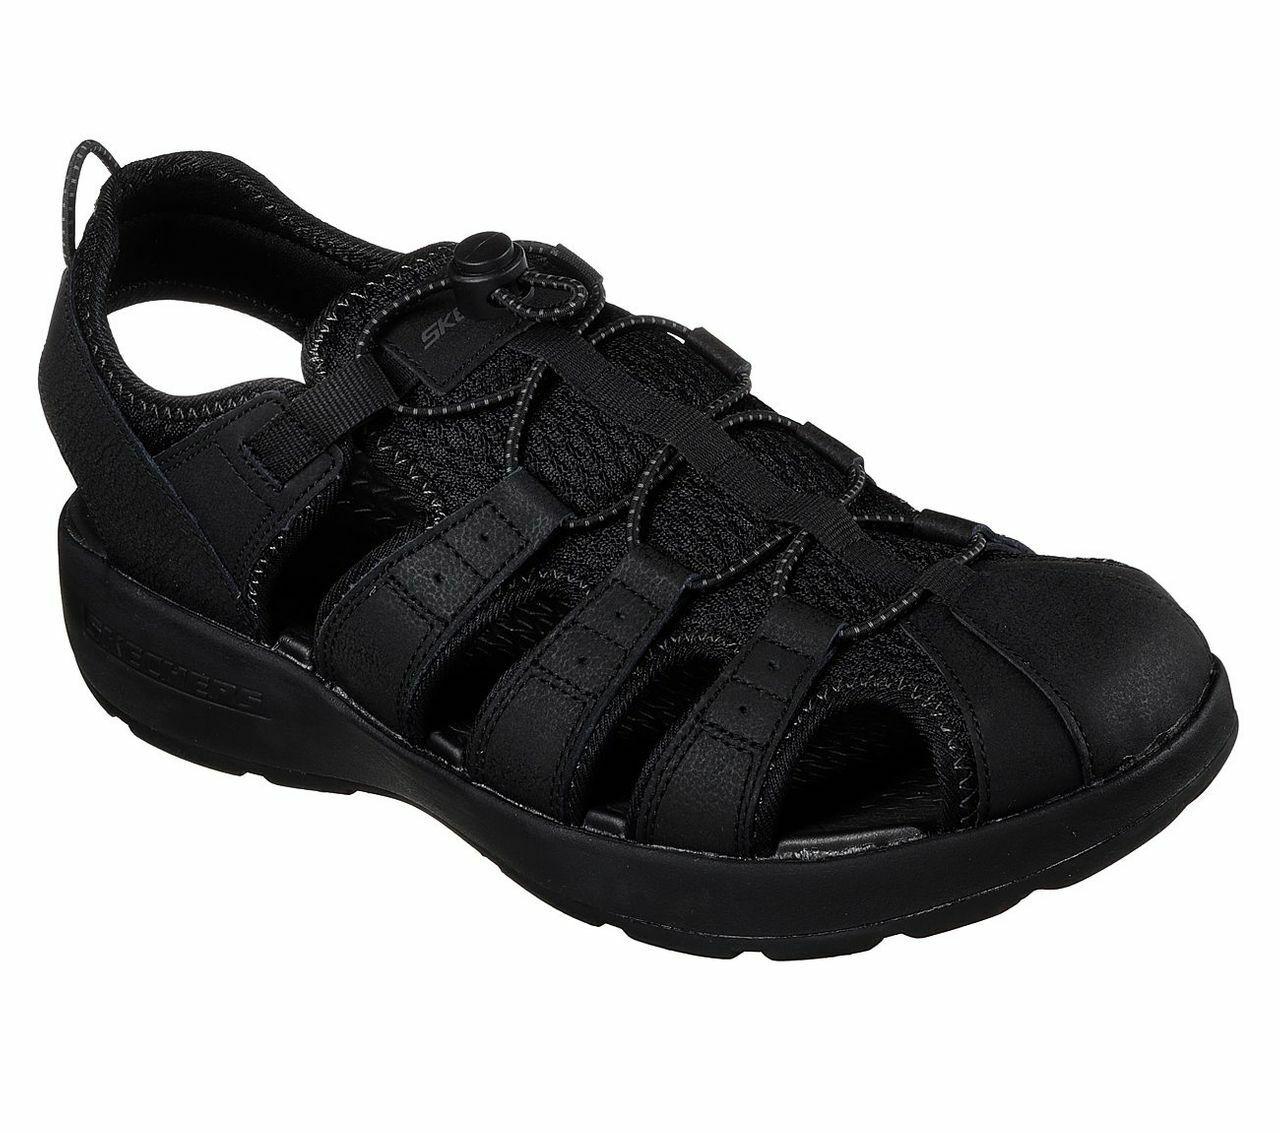 Mens sport casual melbo journeyman 2 mens sandals zapatos negro